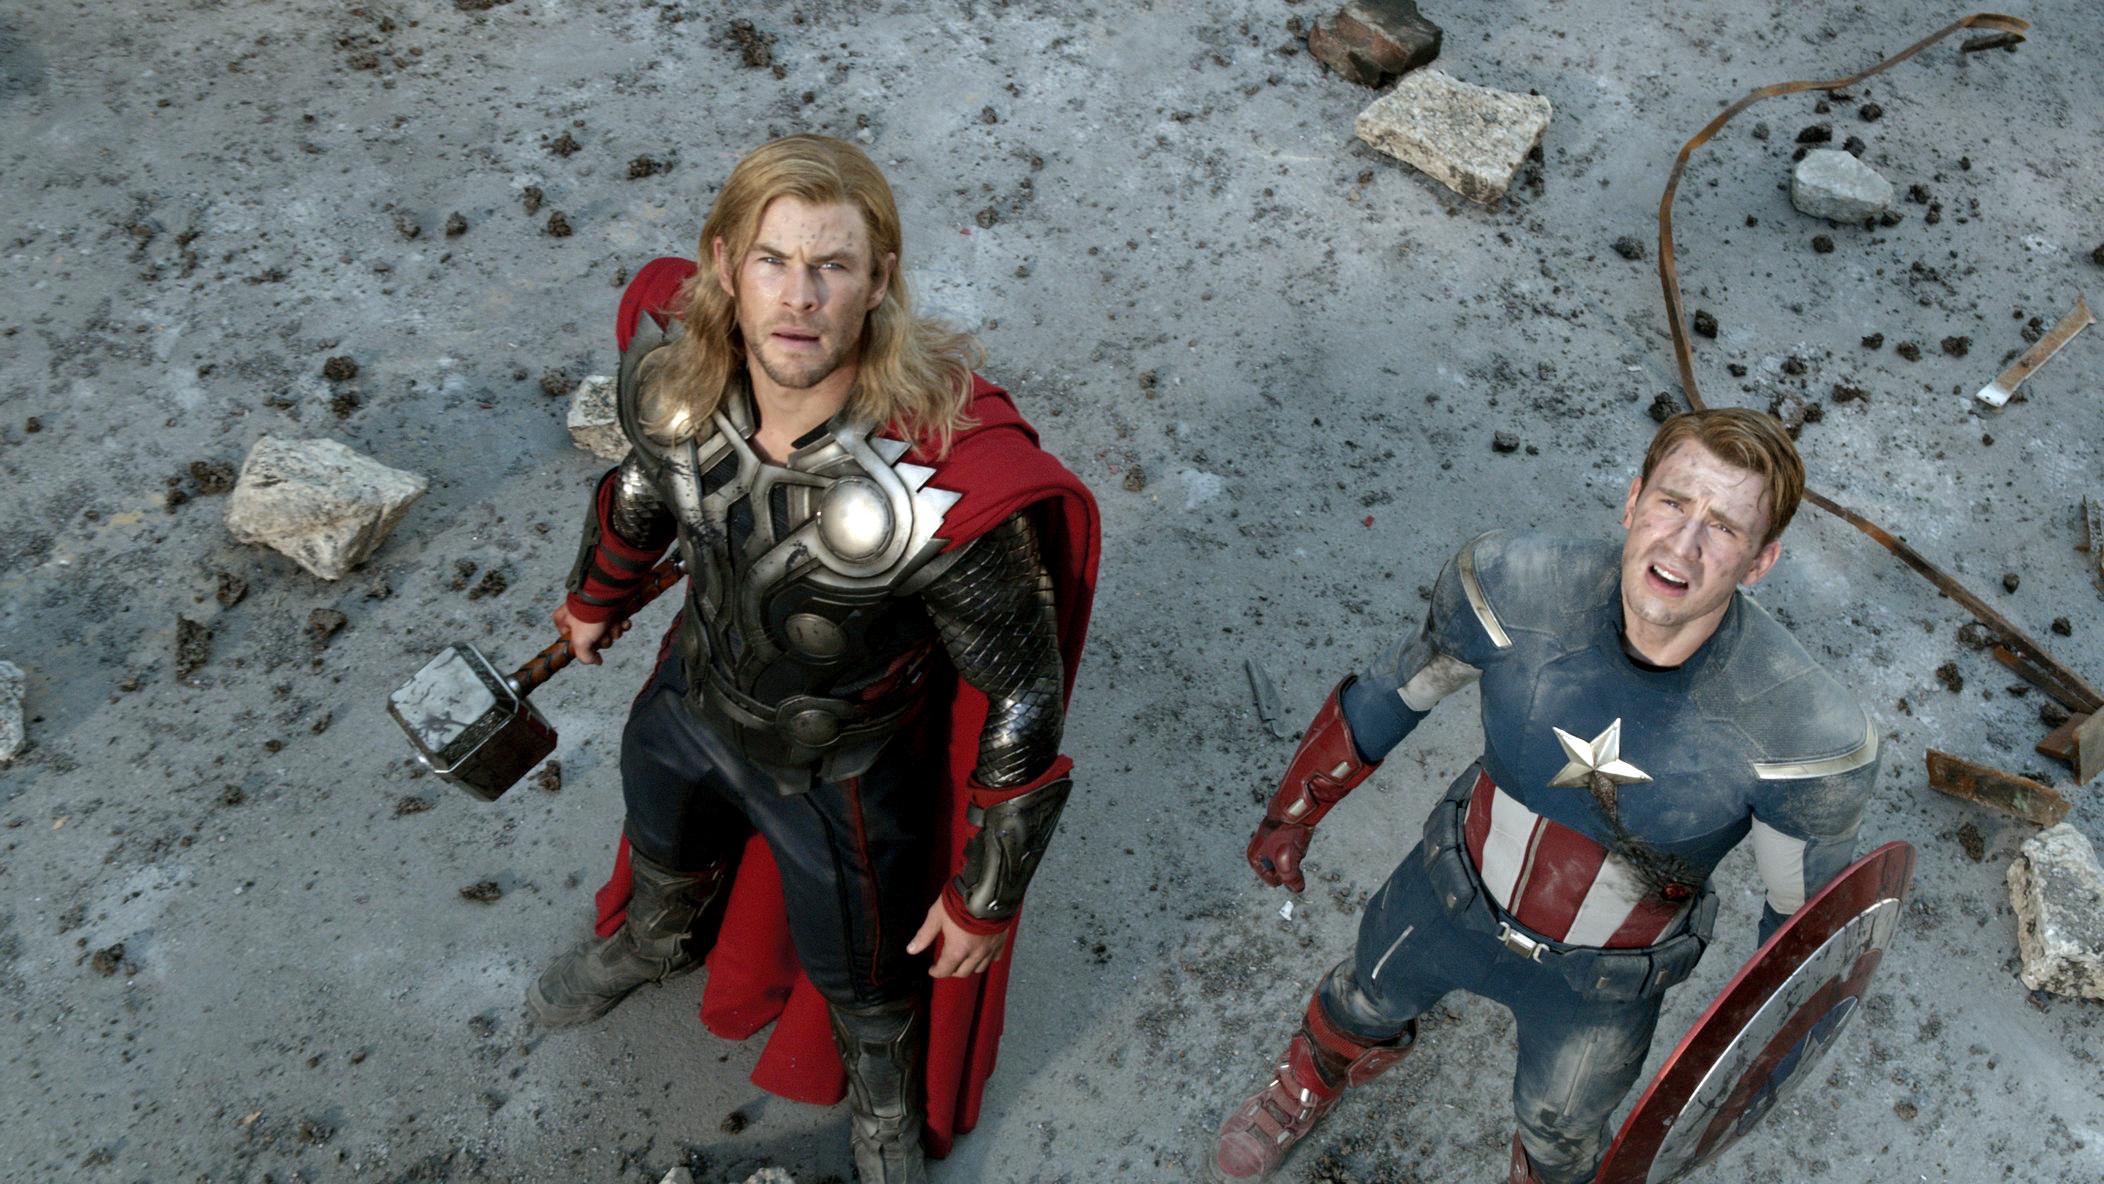 The Movie Roman J Israel >> The Avengers - Thor and Captain America - HeyUGuys